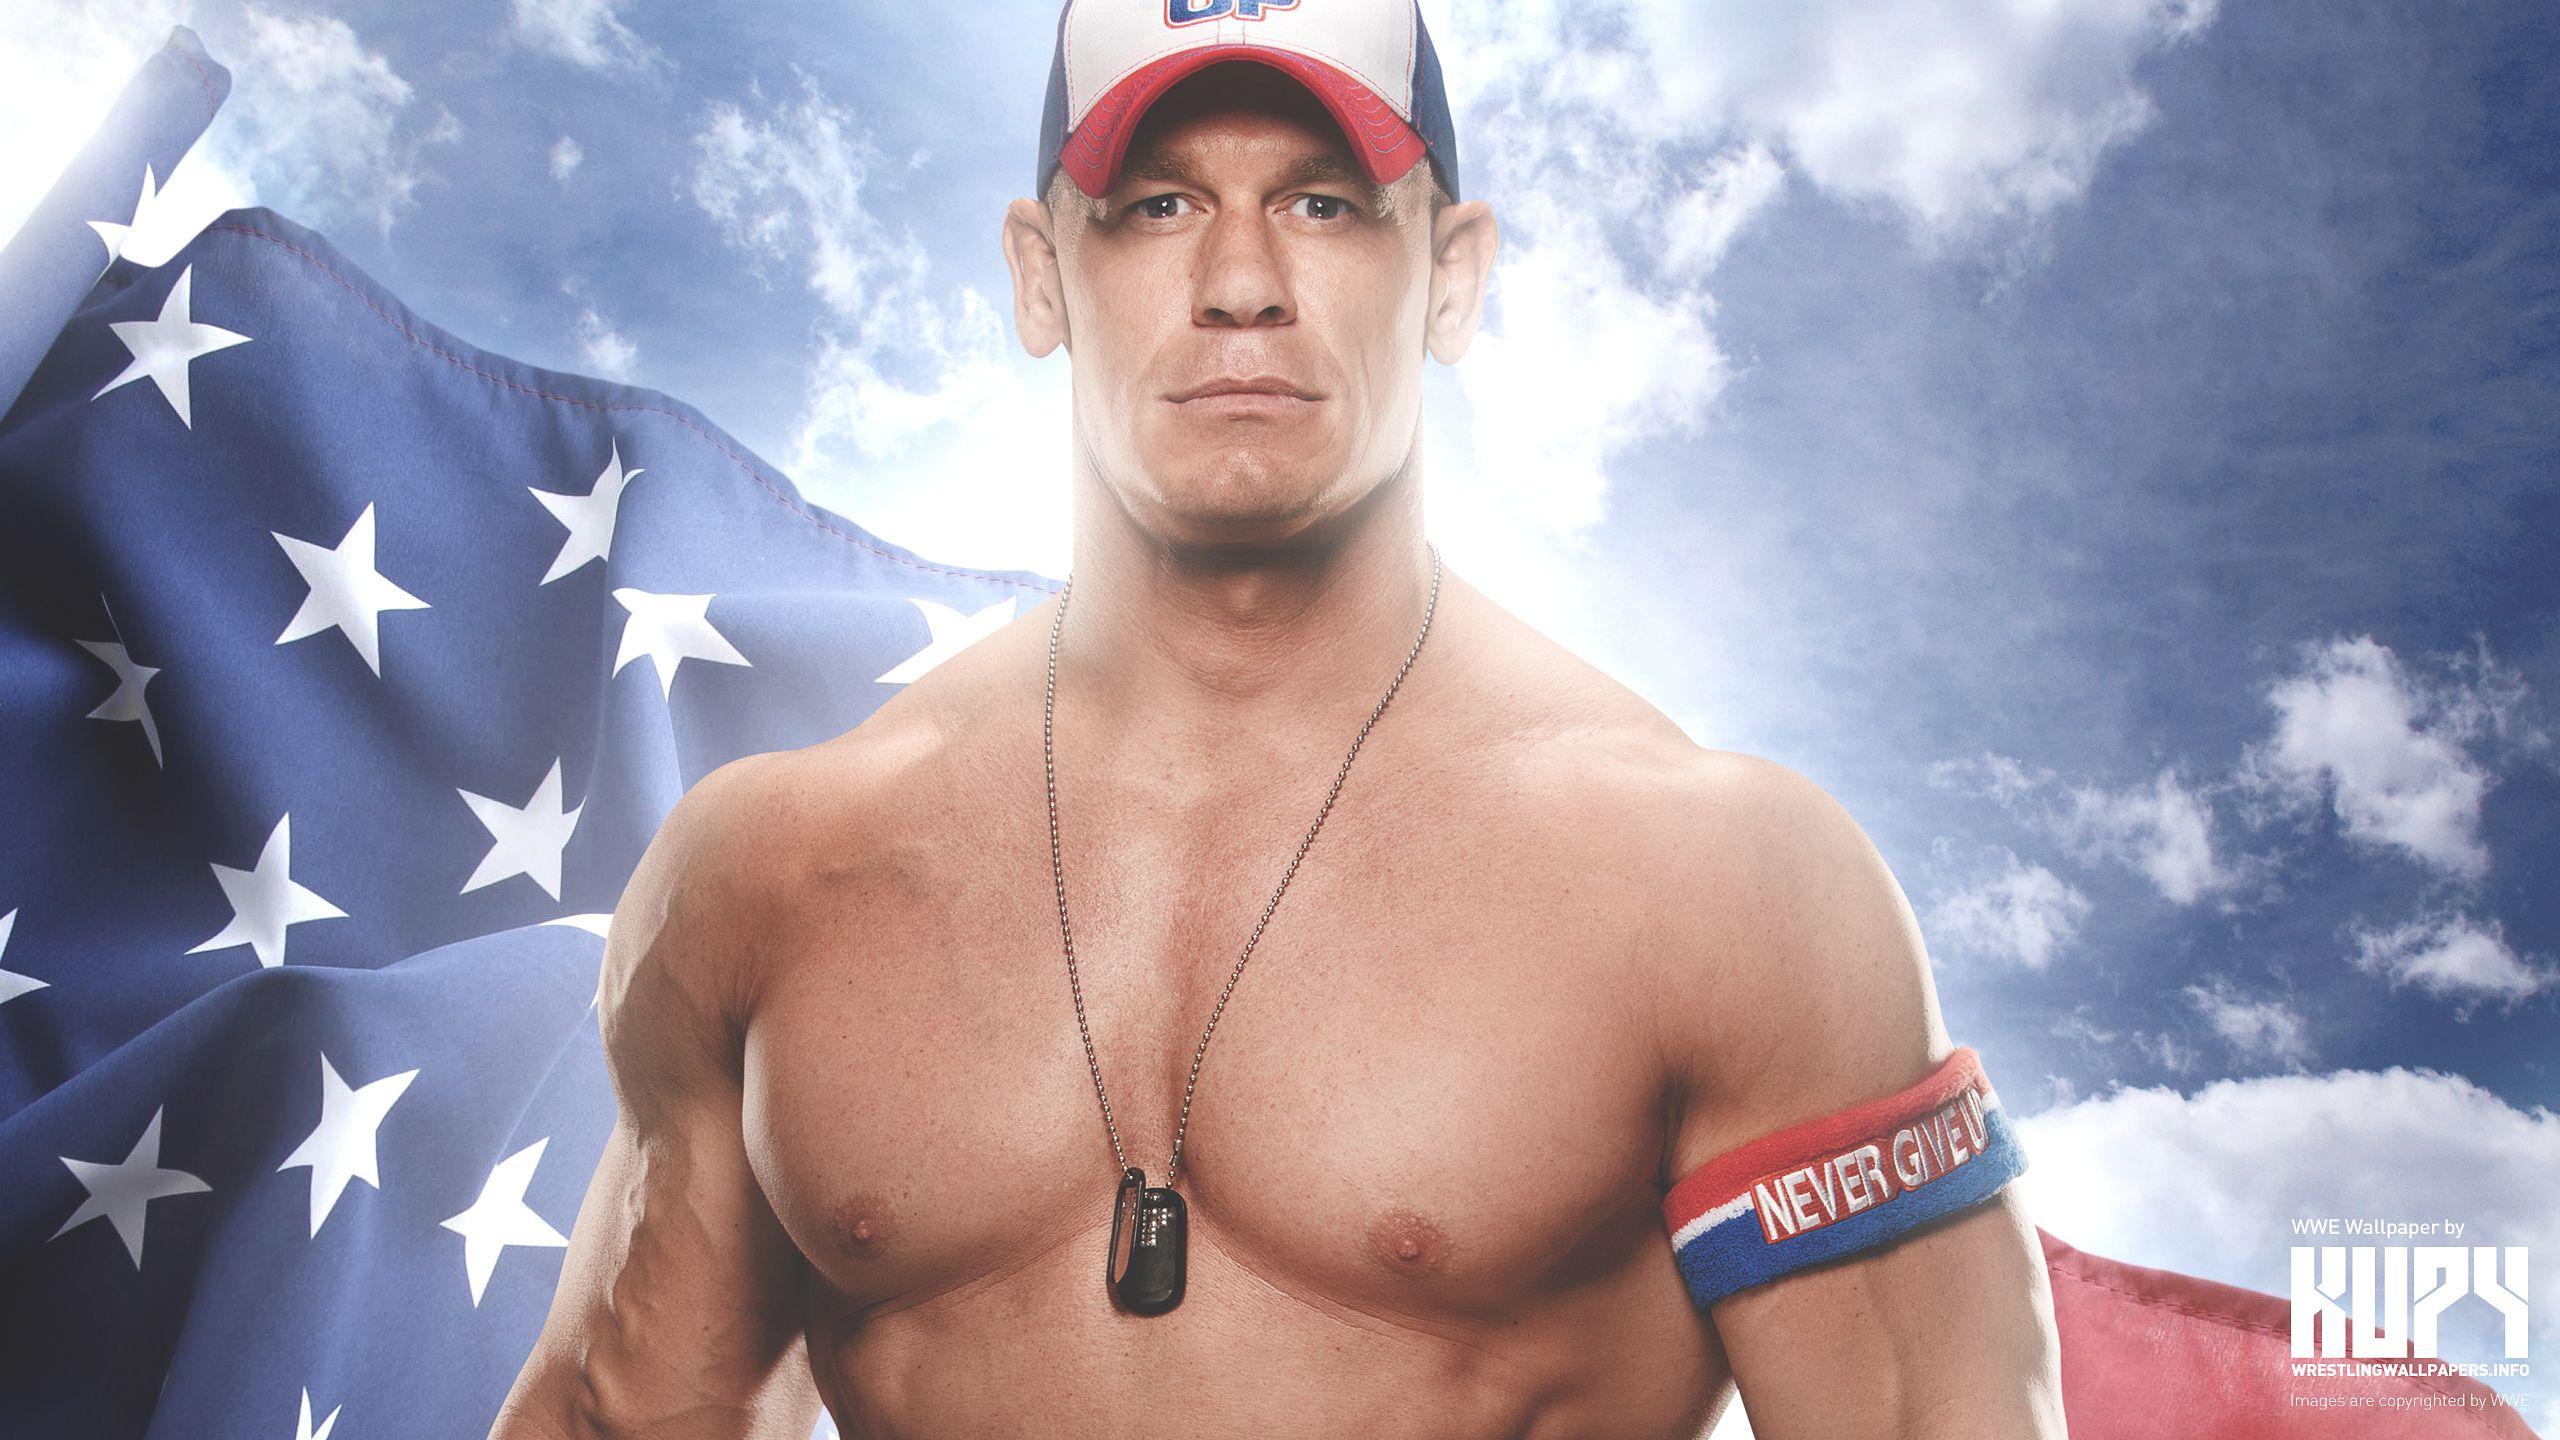 John Cena 2016 John Cena Wallpapers Hd Wallpapers Backgrounds Of